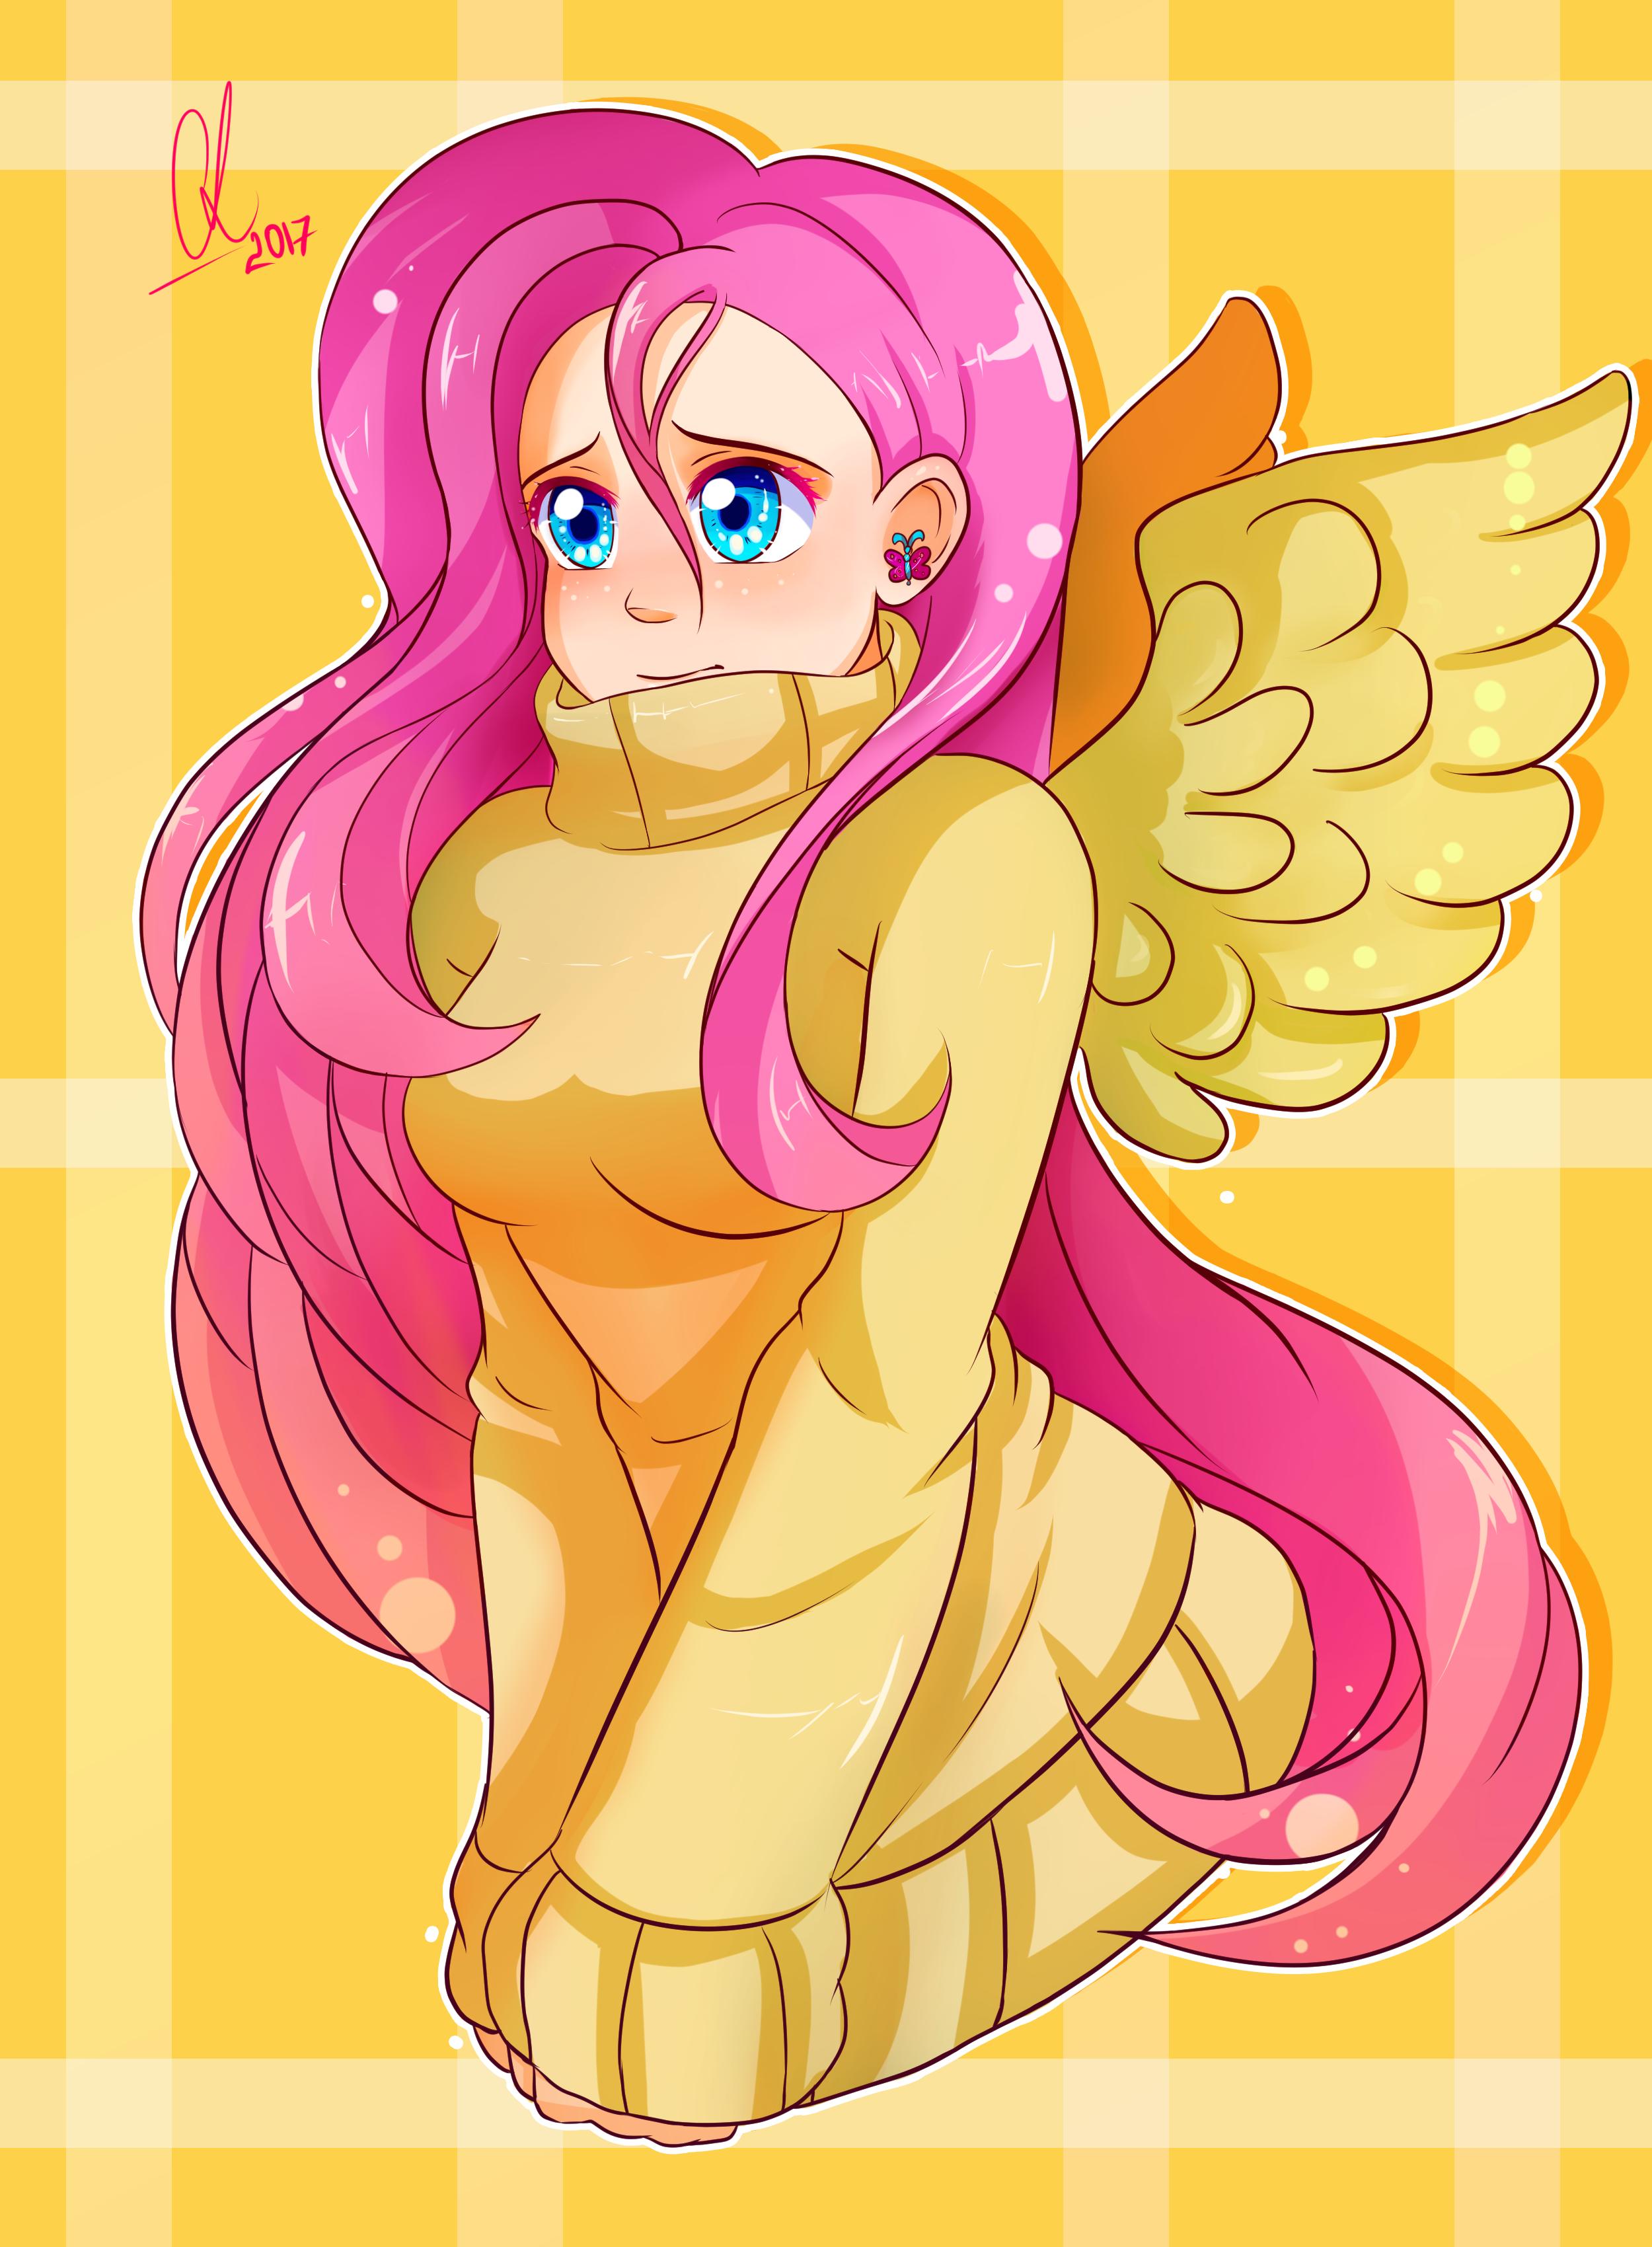 Flattershai - My little pony by Chyche